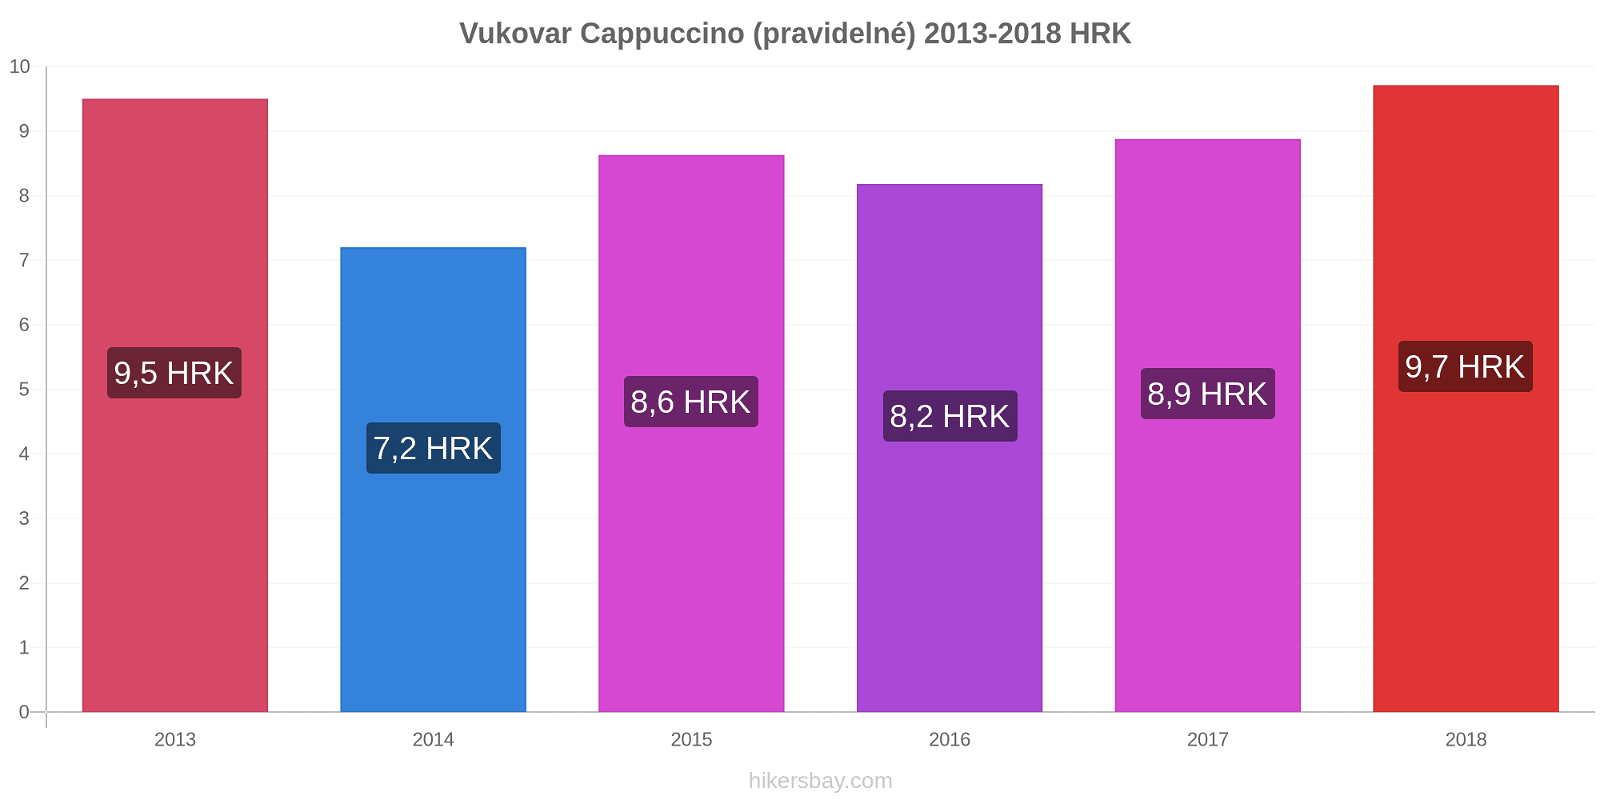 Vukovar změny cen Cappuccino (pravidelné) hikersbay.com